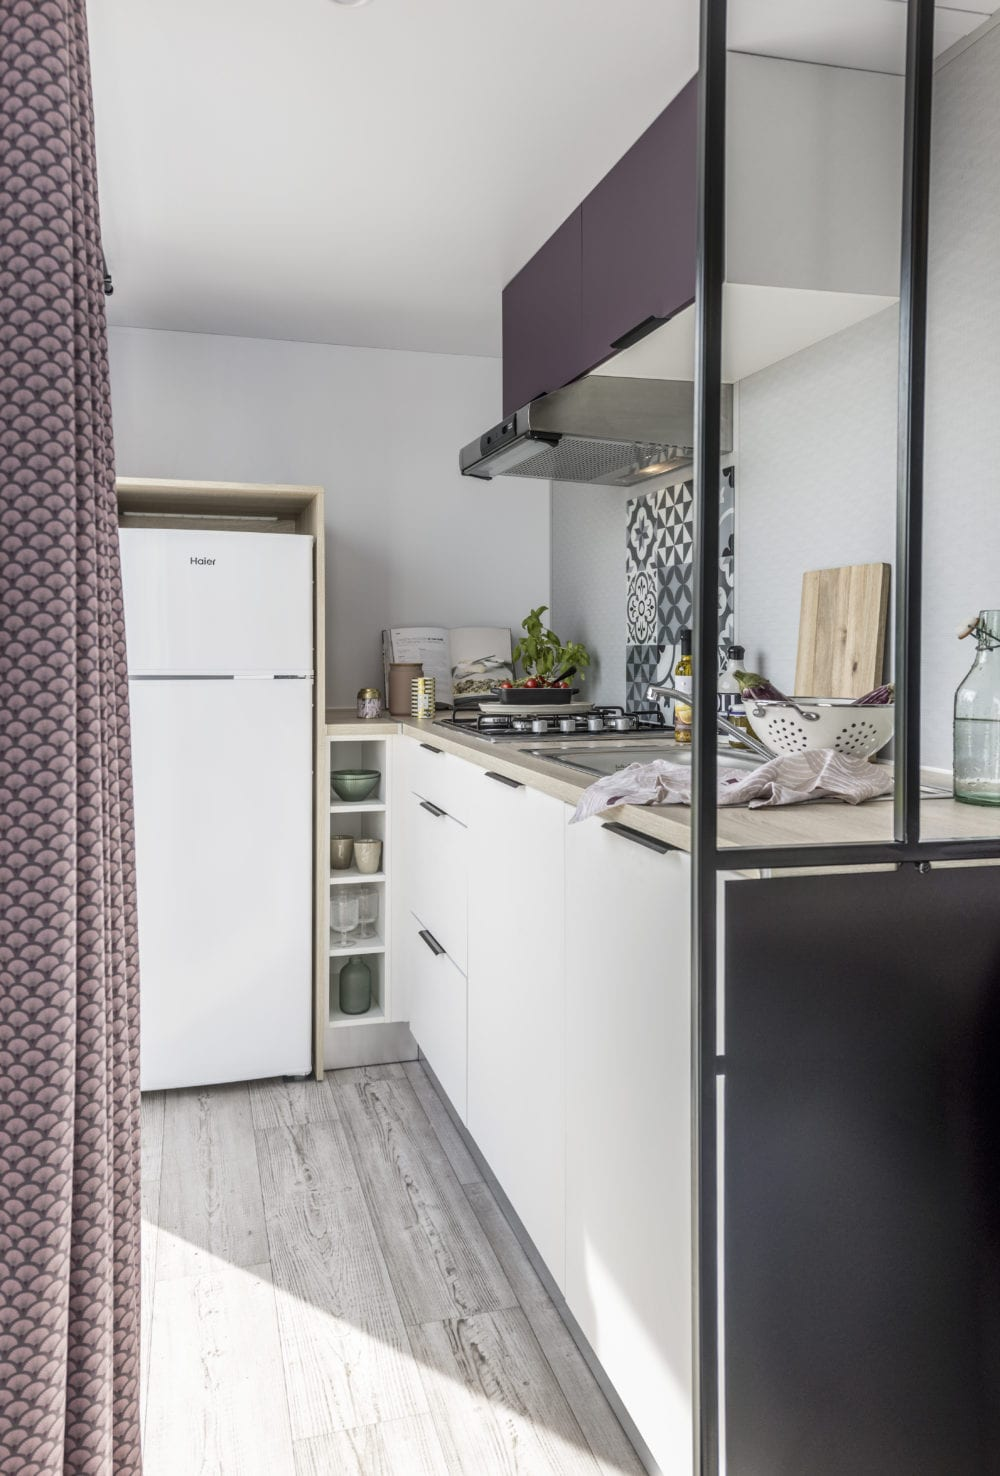 Louisiane grand large 3 - Mobil neuf - Vacance - 2019 - Zen Mobil homes